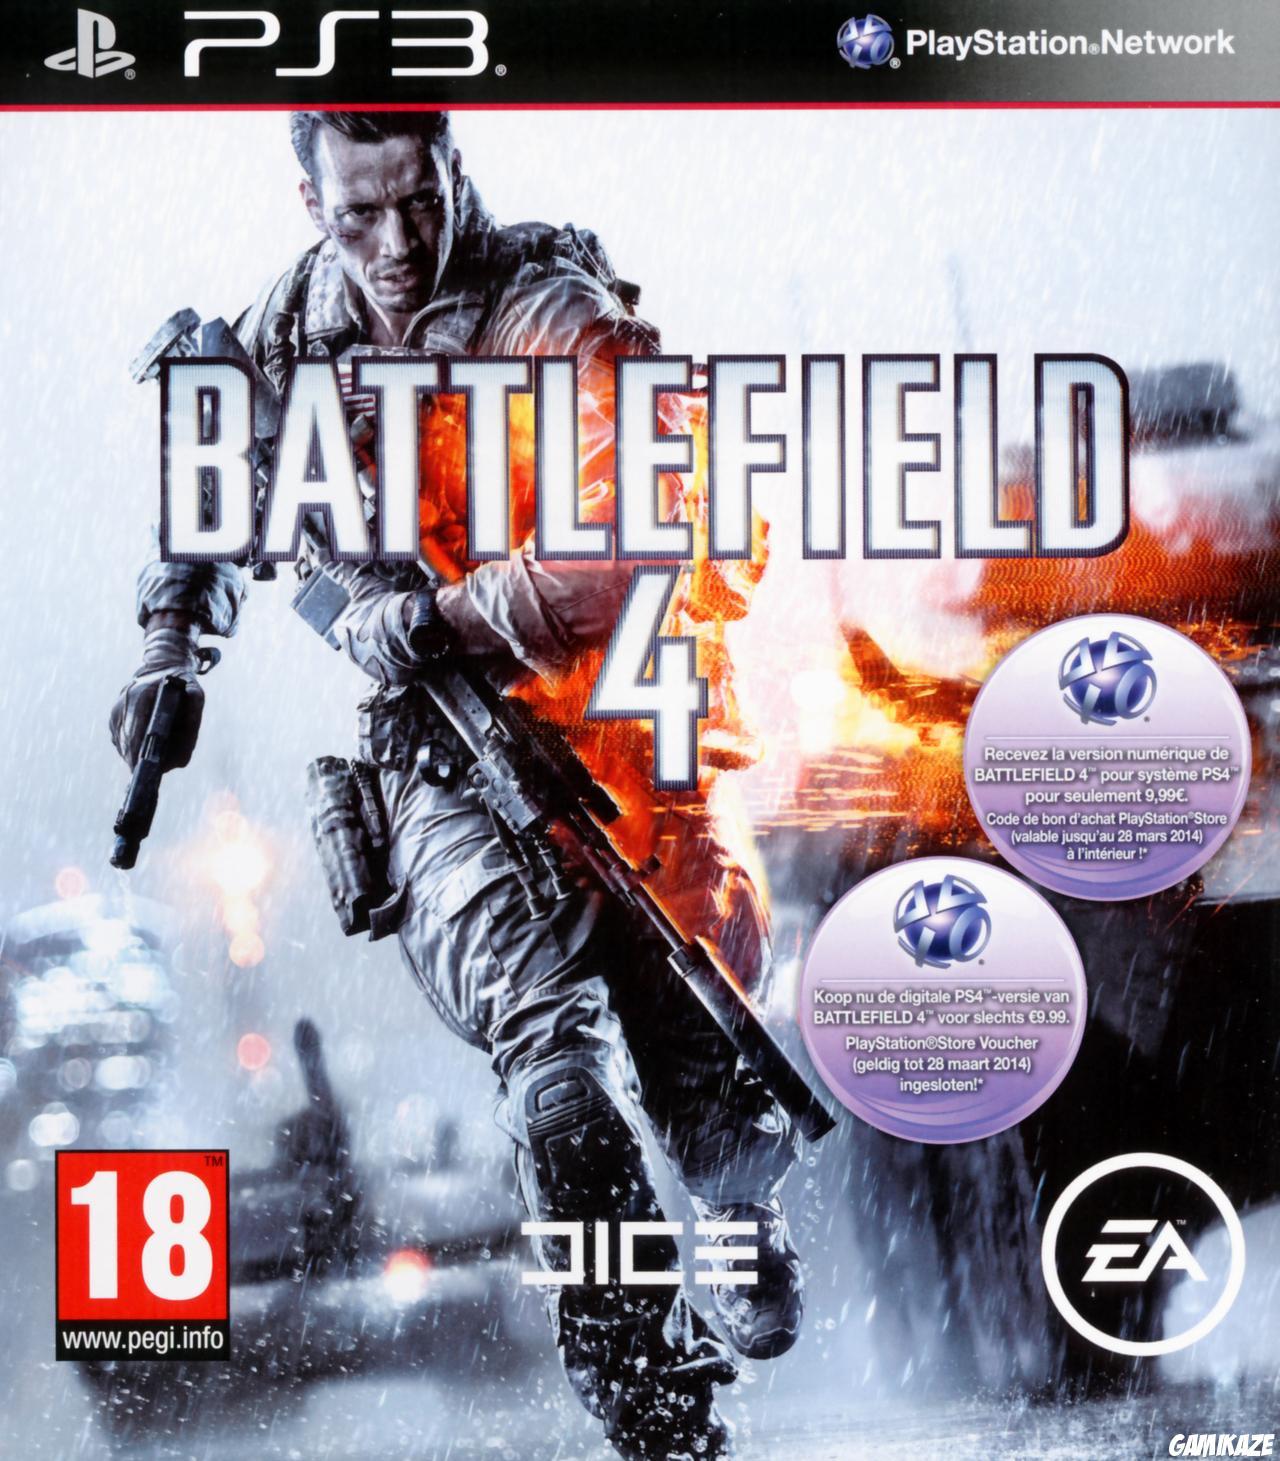 Battlefield 4 for PlayStation 4 (R2)